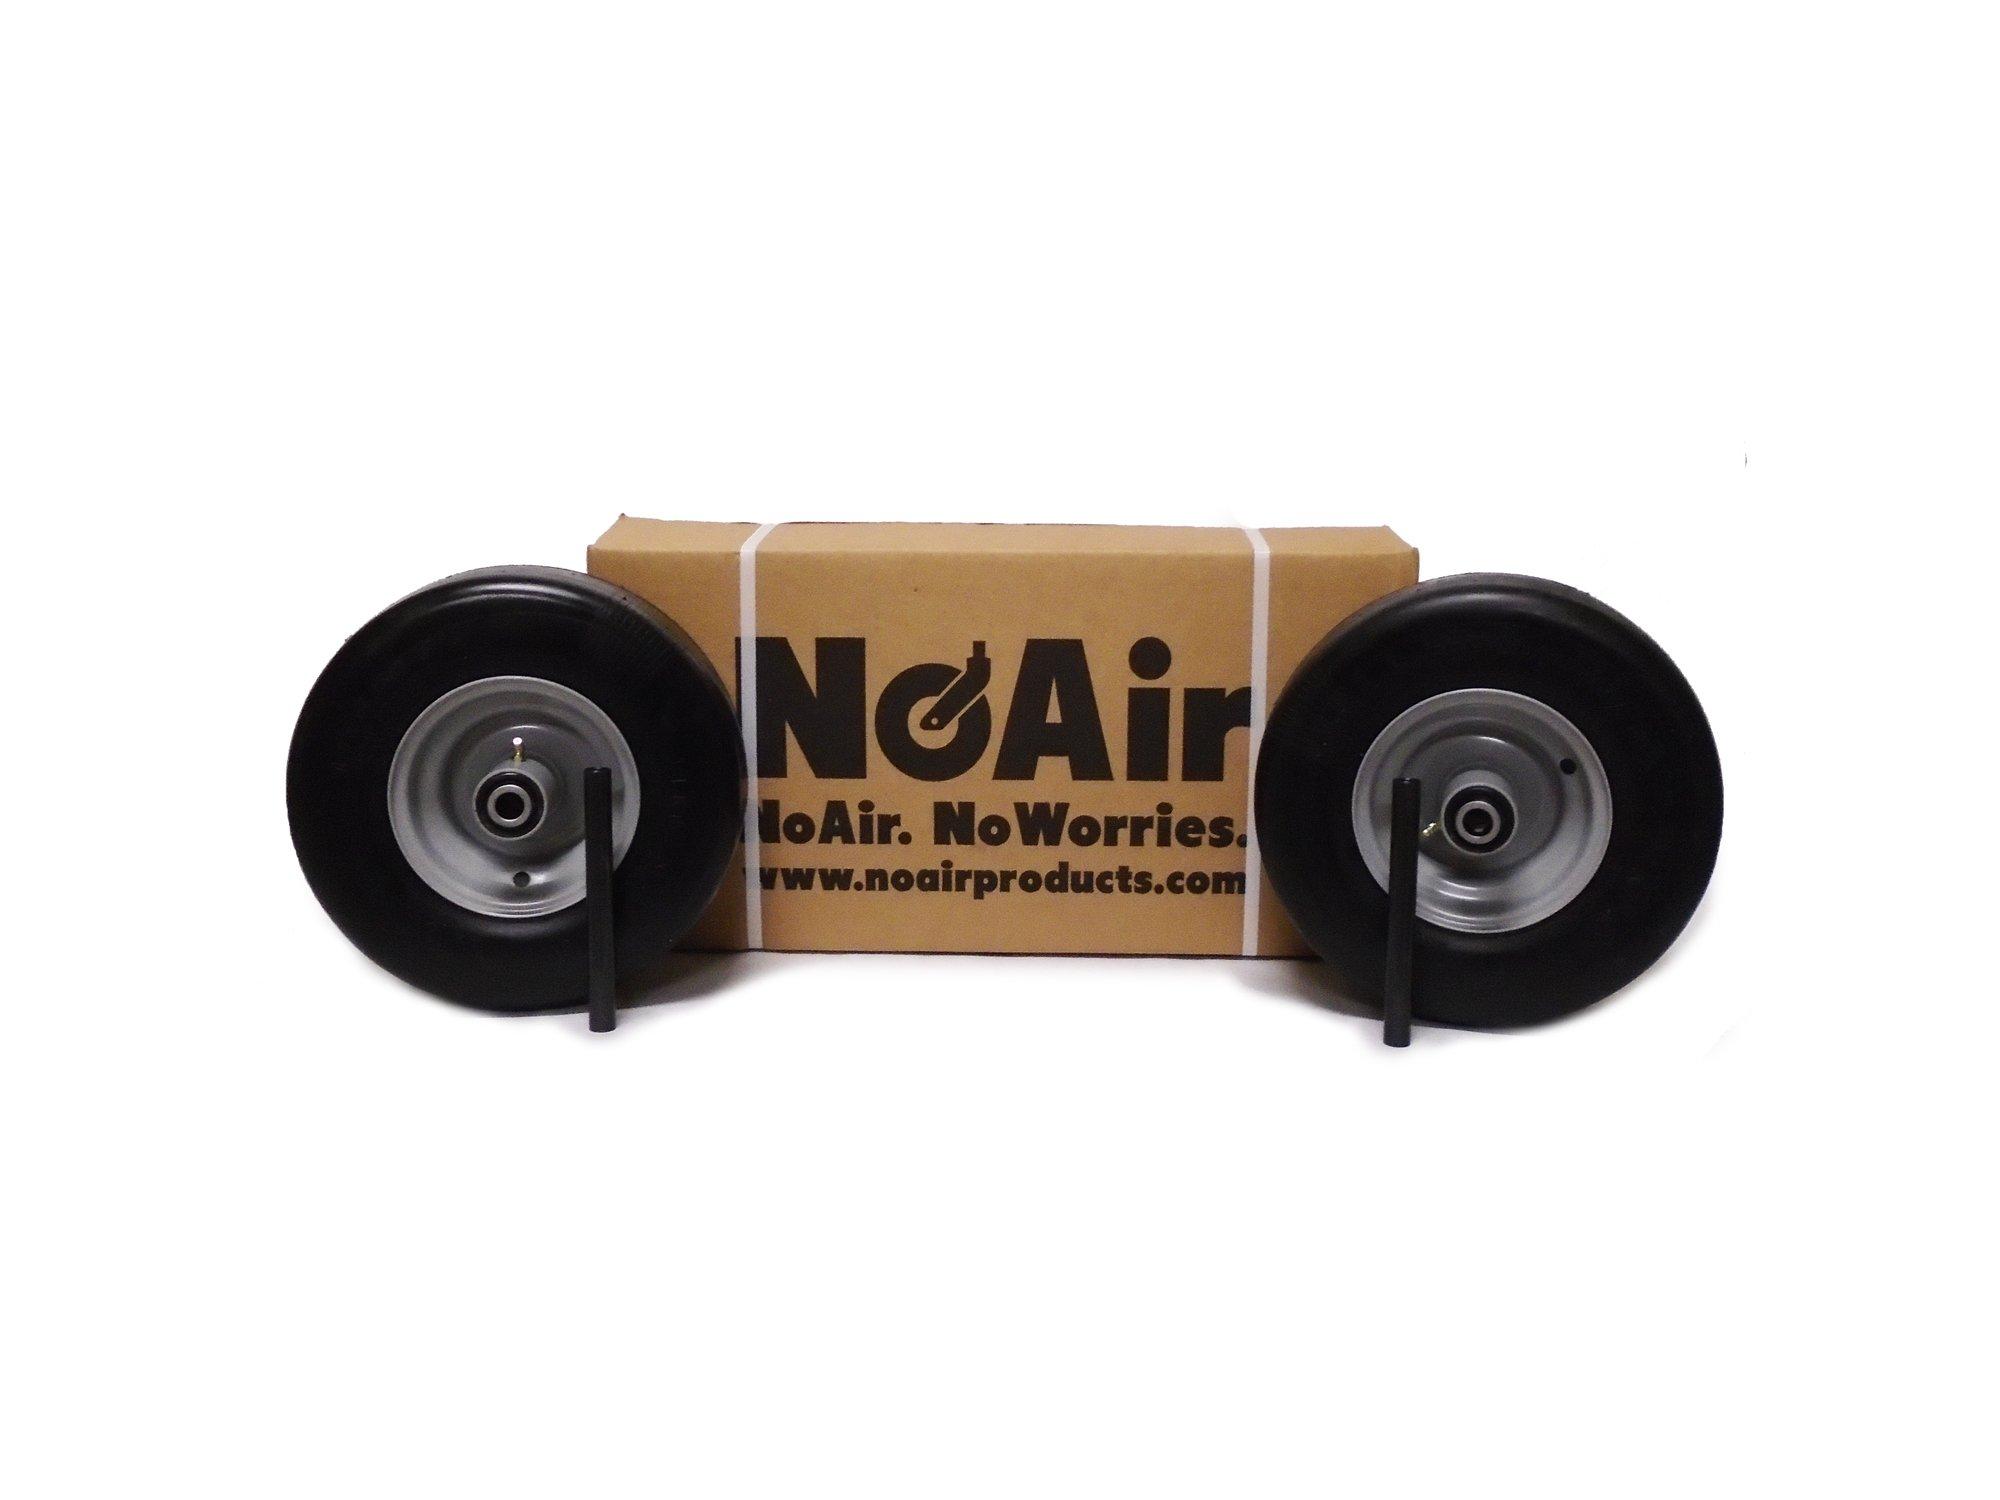 (2) Ferris Flat Free Tire Assemblies 13x5.00-6 IS 1500 2000 2100 Part 5022631 by NoAir (Image #1)